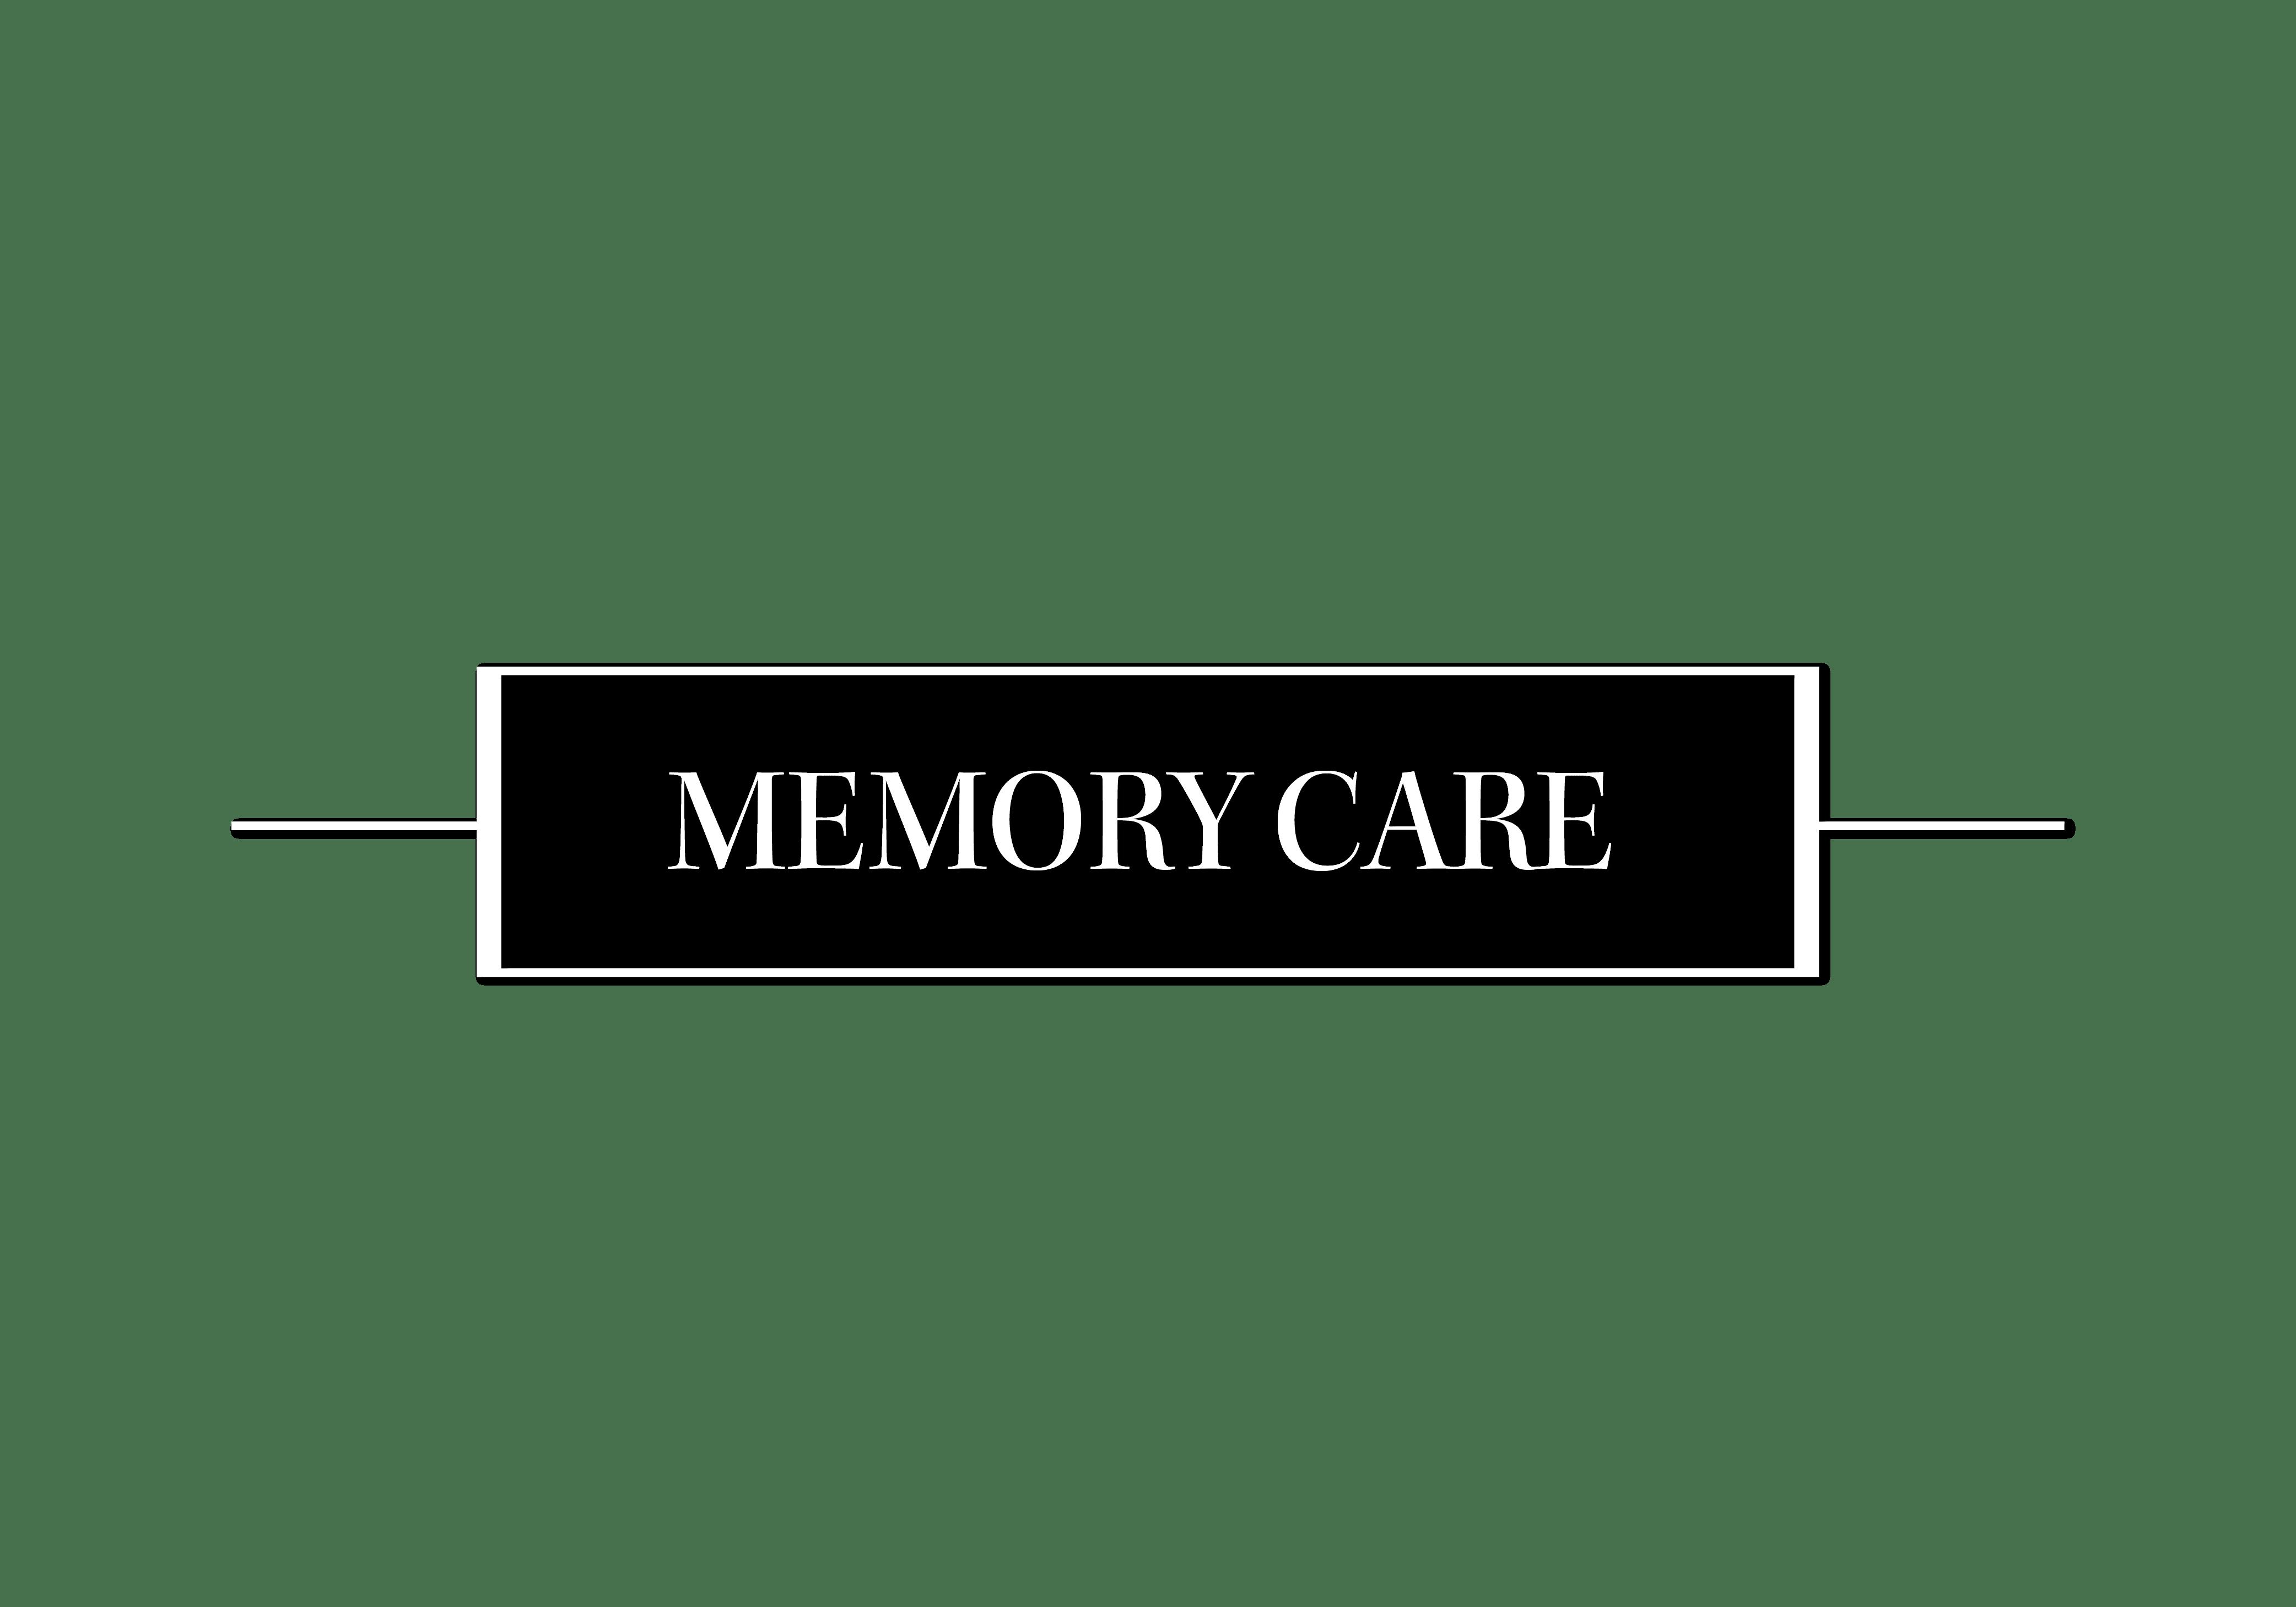 memory care graphic